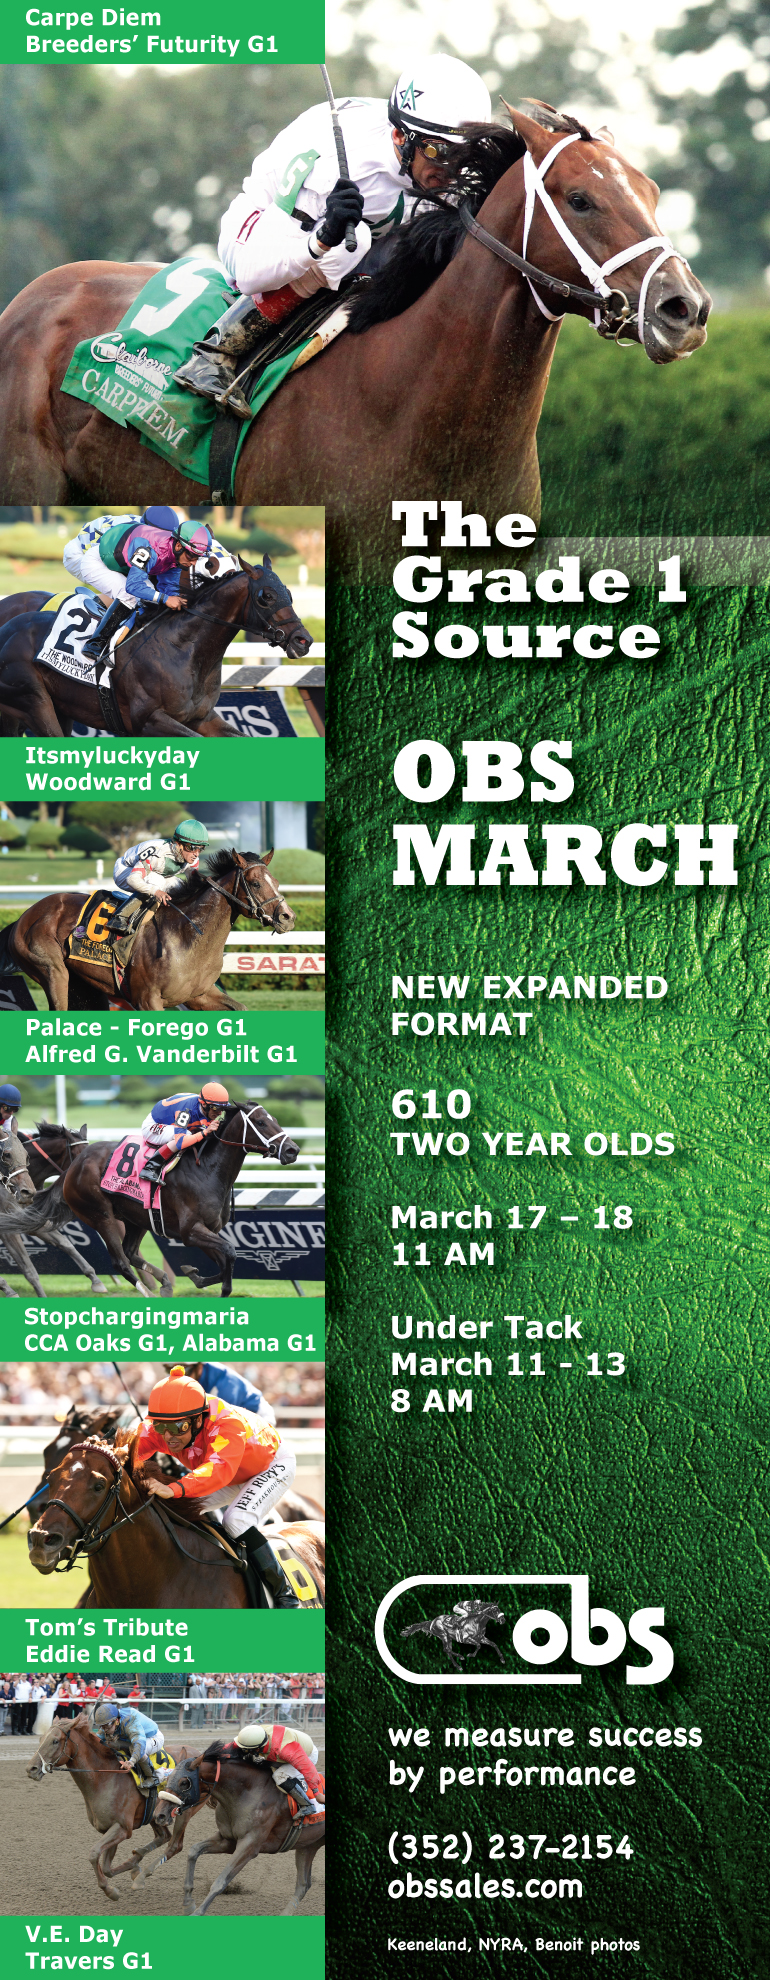 obs march 2015 TDN half photos Six G1 winners